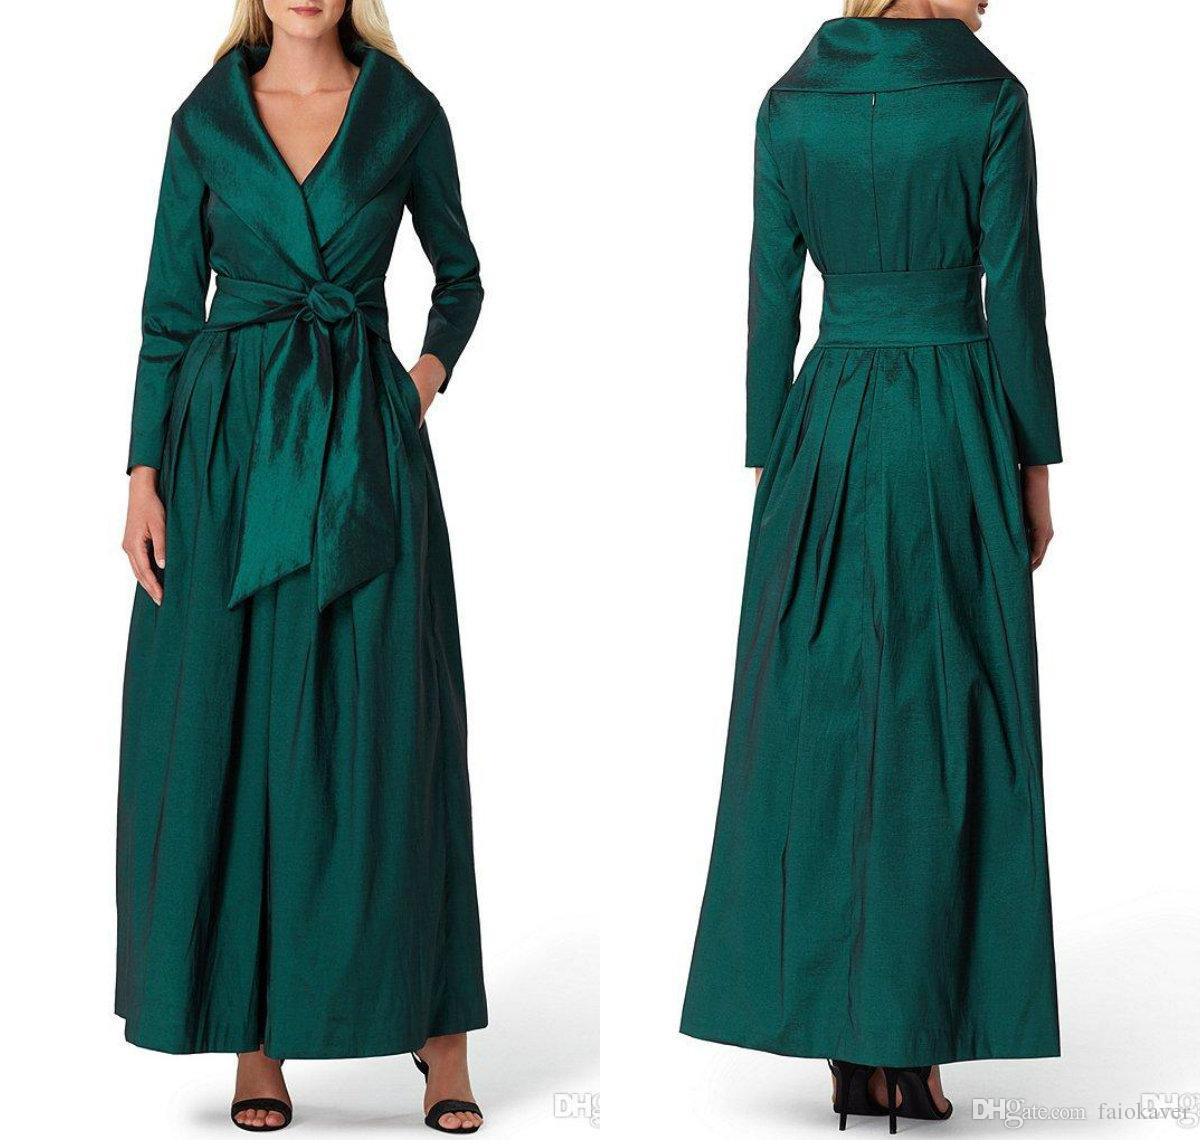 2019 Hunter Mother Of The Bride Dresses V Neck Belt Ankle Length Long Sleeve Wedding Guest Dress Plus Size Mother Gowns